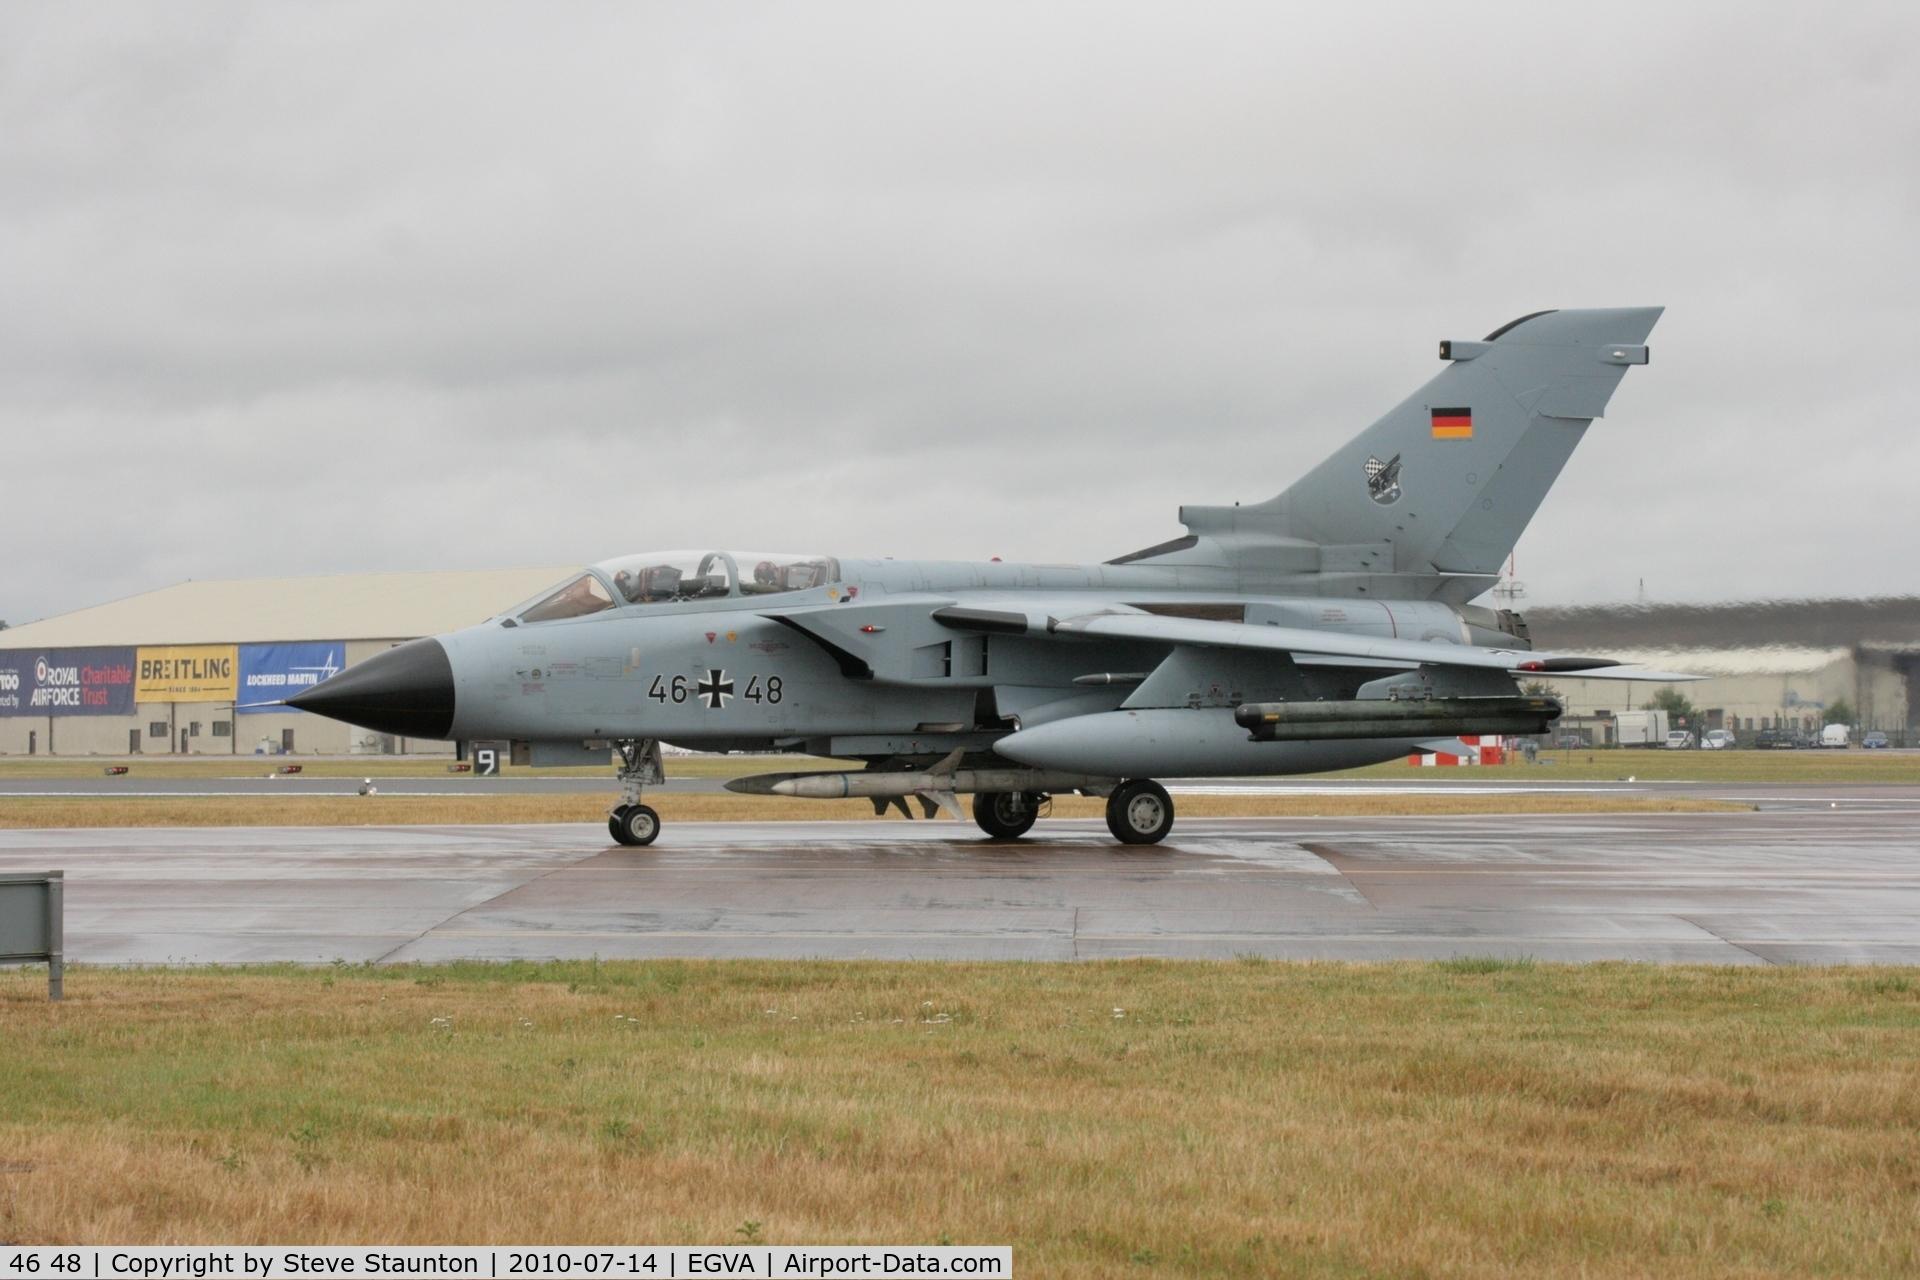 46 48, Panavia Tornado ECR C/N 881/GS281/4348, Taken at the Royal International Air Tattoo 2010